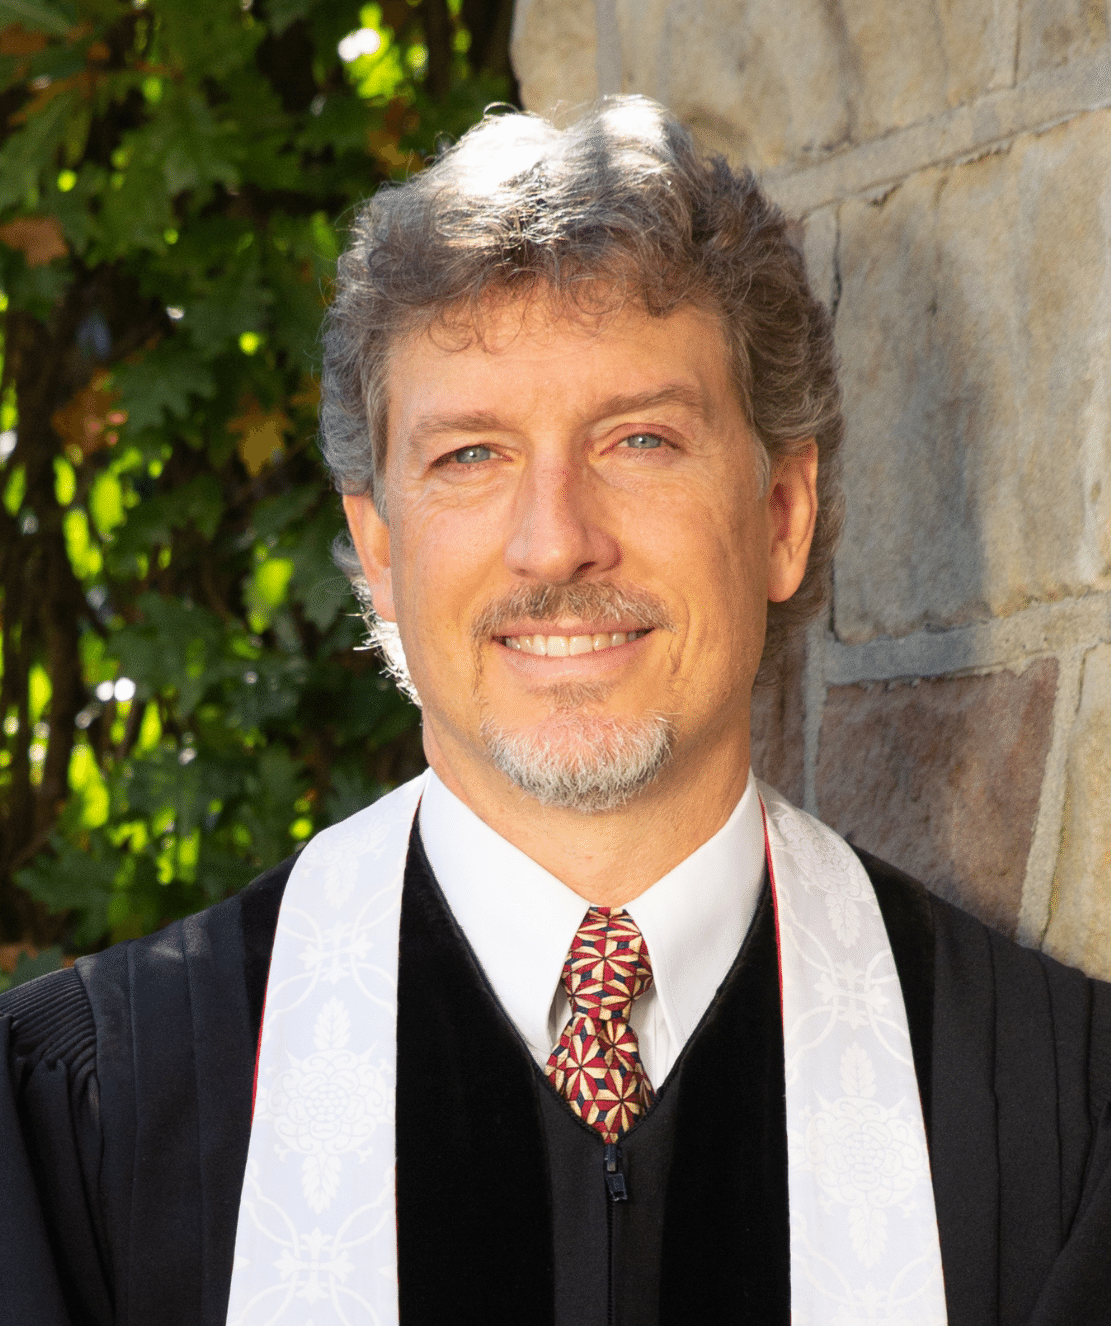 Rev. Kevin Long